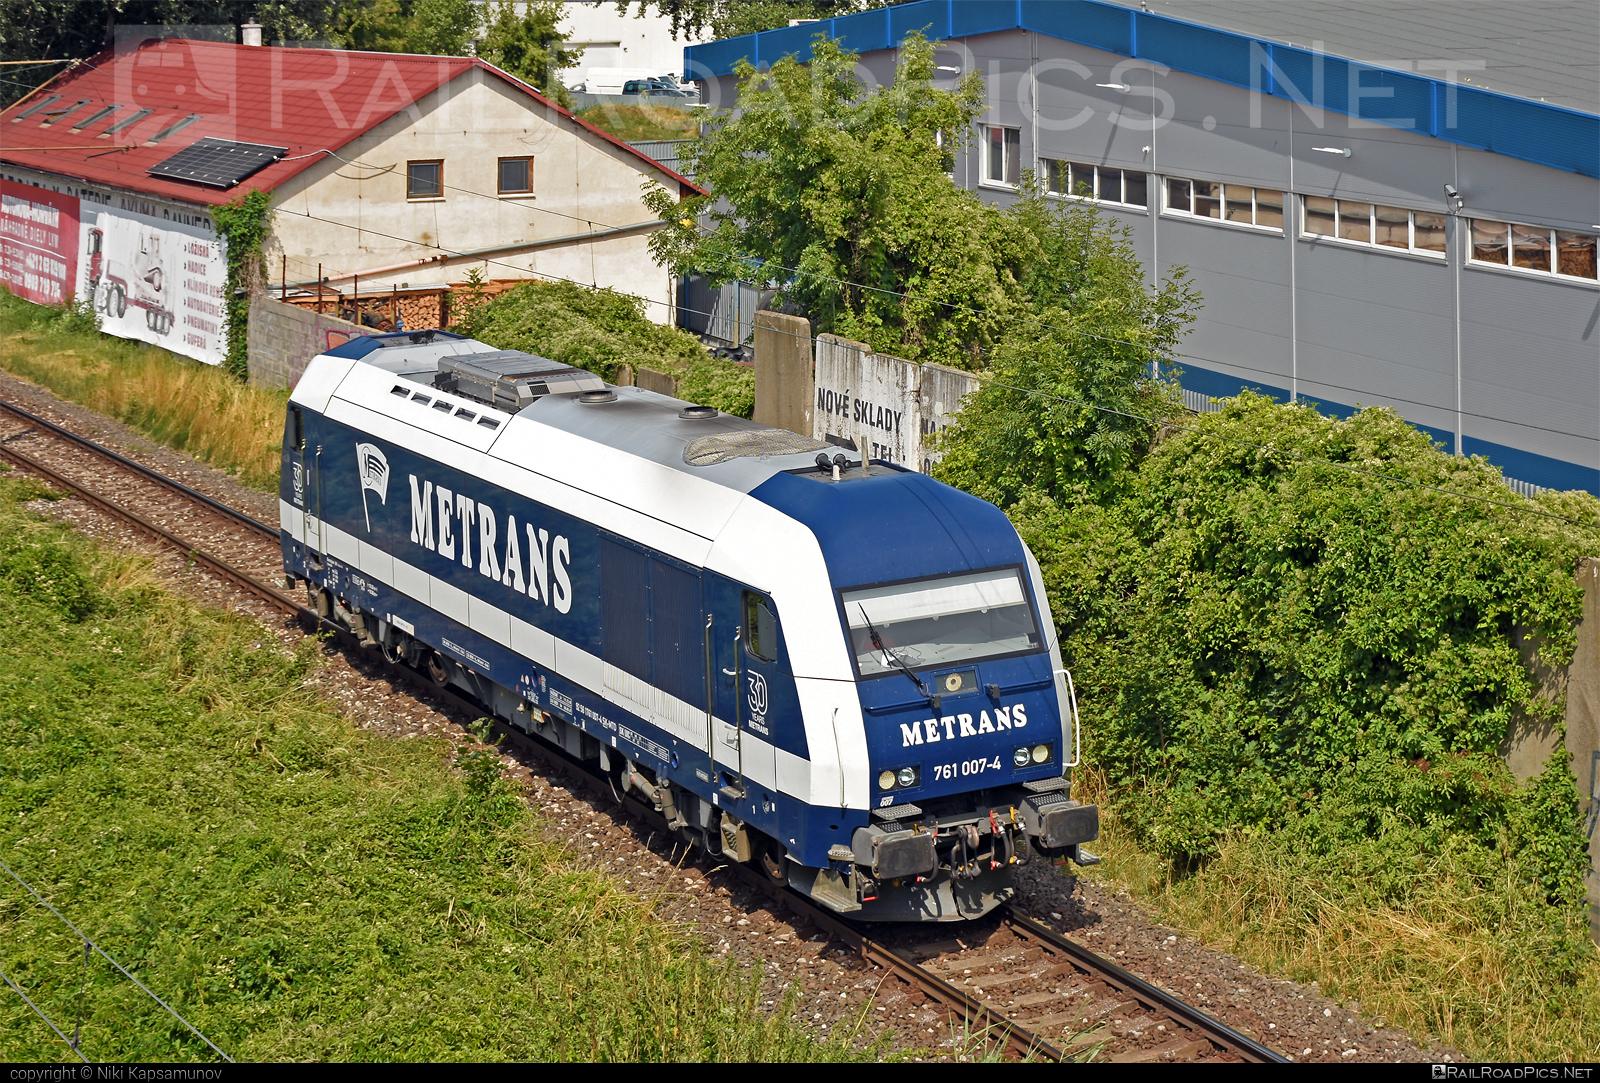 Siemens ER20 - 761 007-4 operated by METRANS (Danubia) a.s. #er20 #er20hercules #eurorunner #hercules #hhla #metrans #metransdanubia #siemens #siemenser20 #siemenser20hercules #siemenseurorunner #siemenshercules